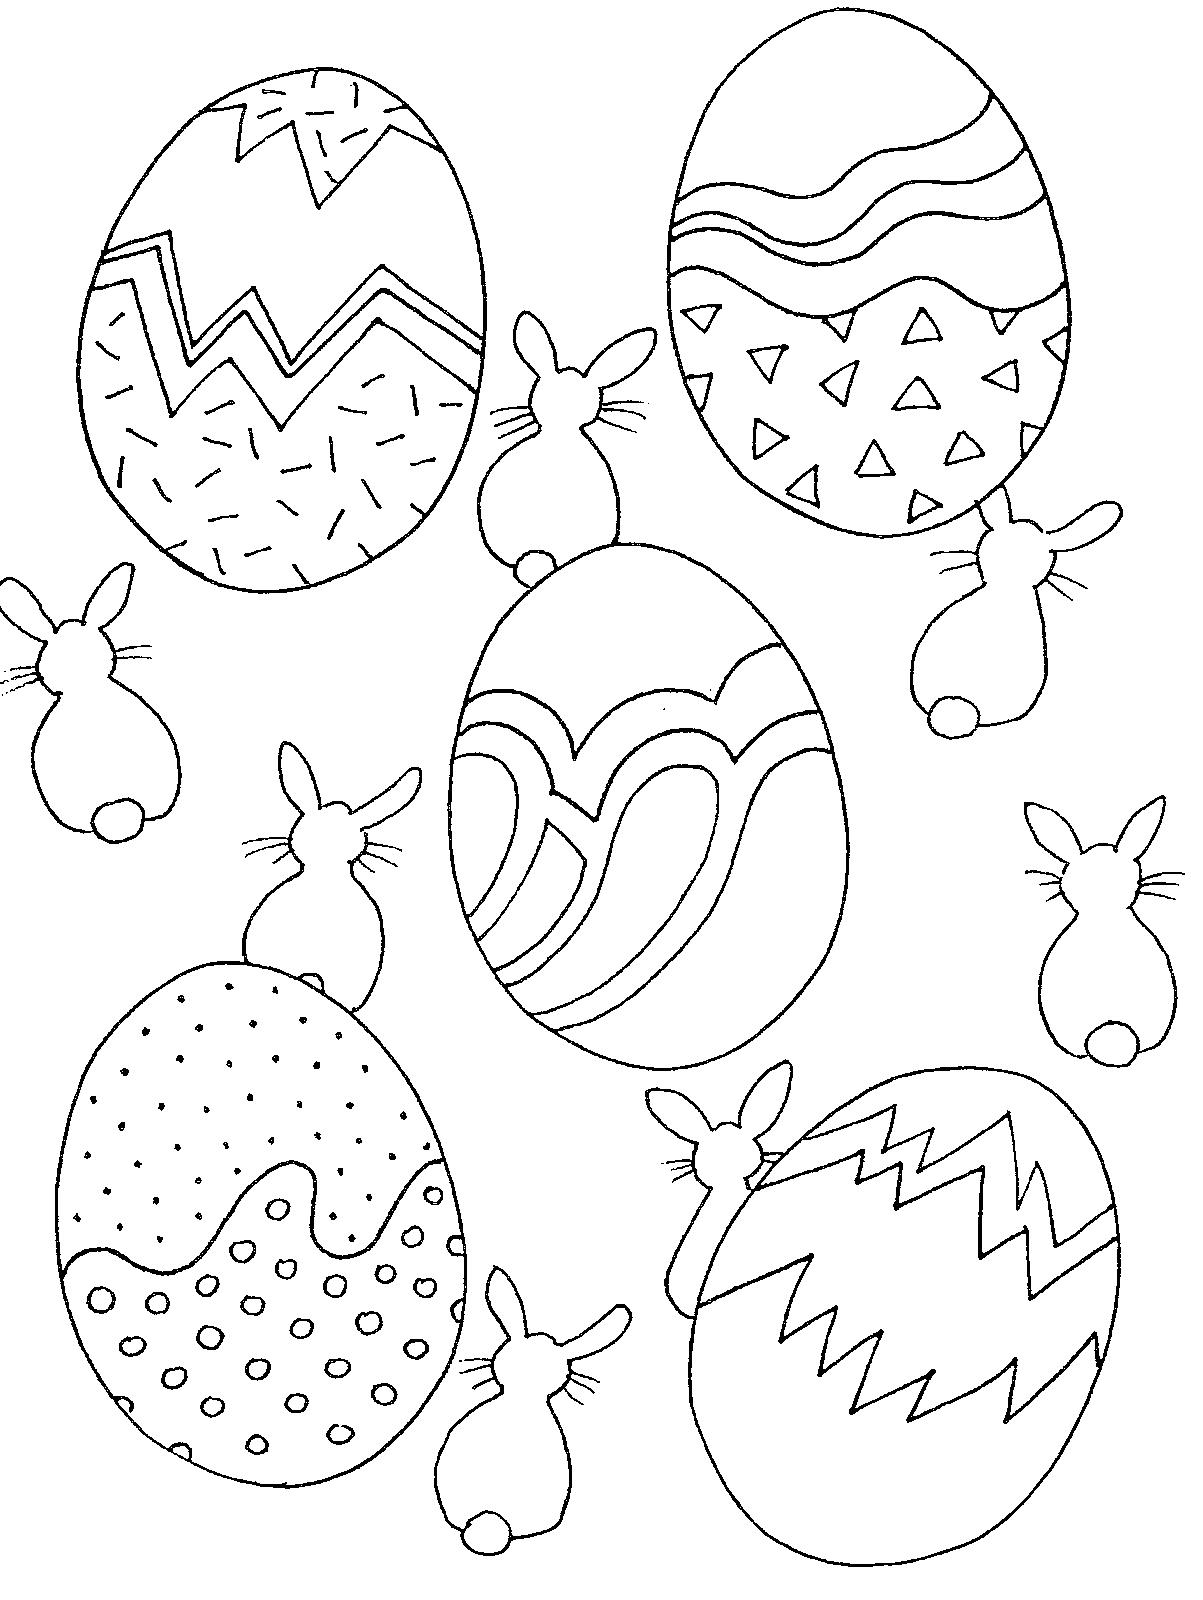 Desenho Para Imprimir E Colorir Pascoa Ovos Proessora Coruja